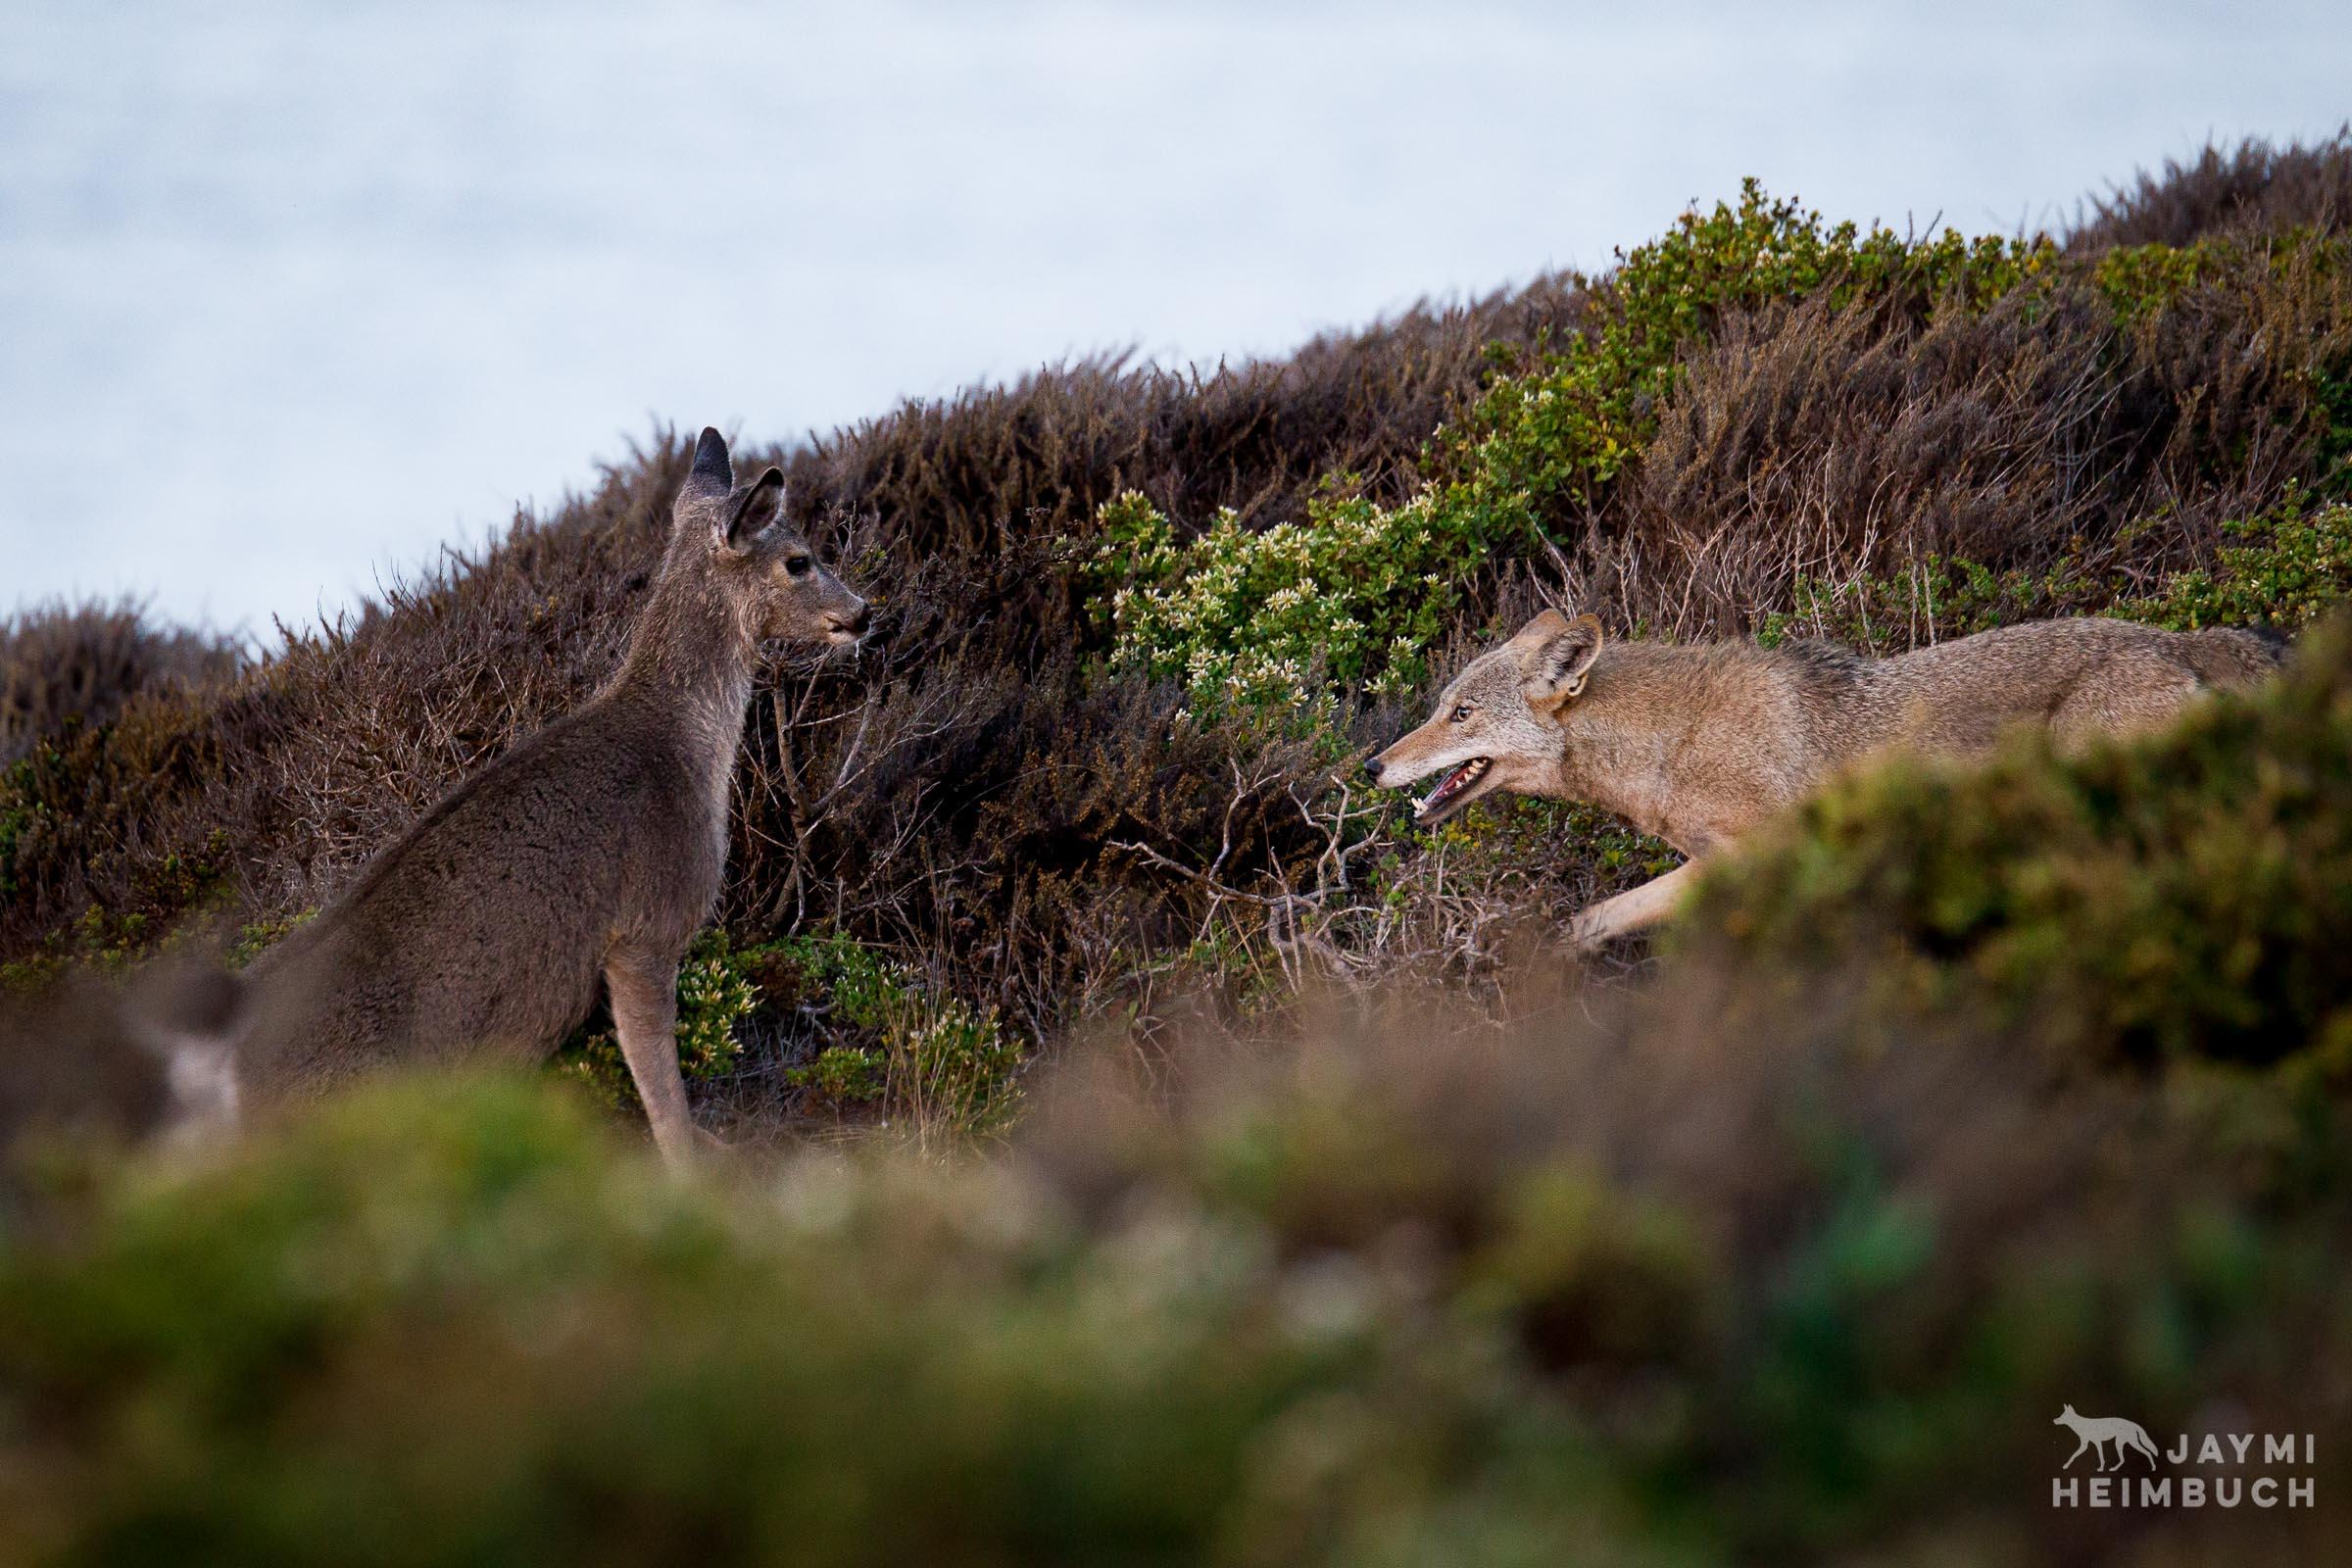 Coyote (canis latrans) adult female hunting yearling mule deer, Marin Headlands, California